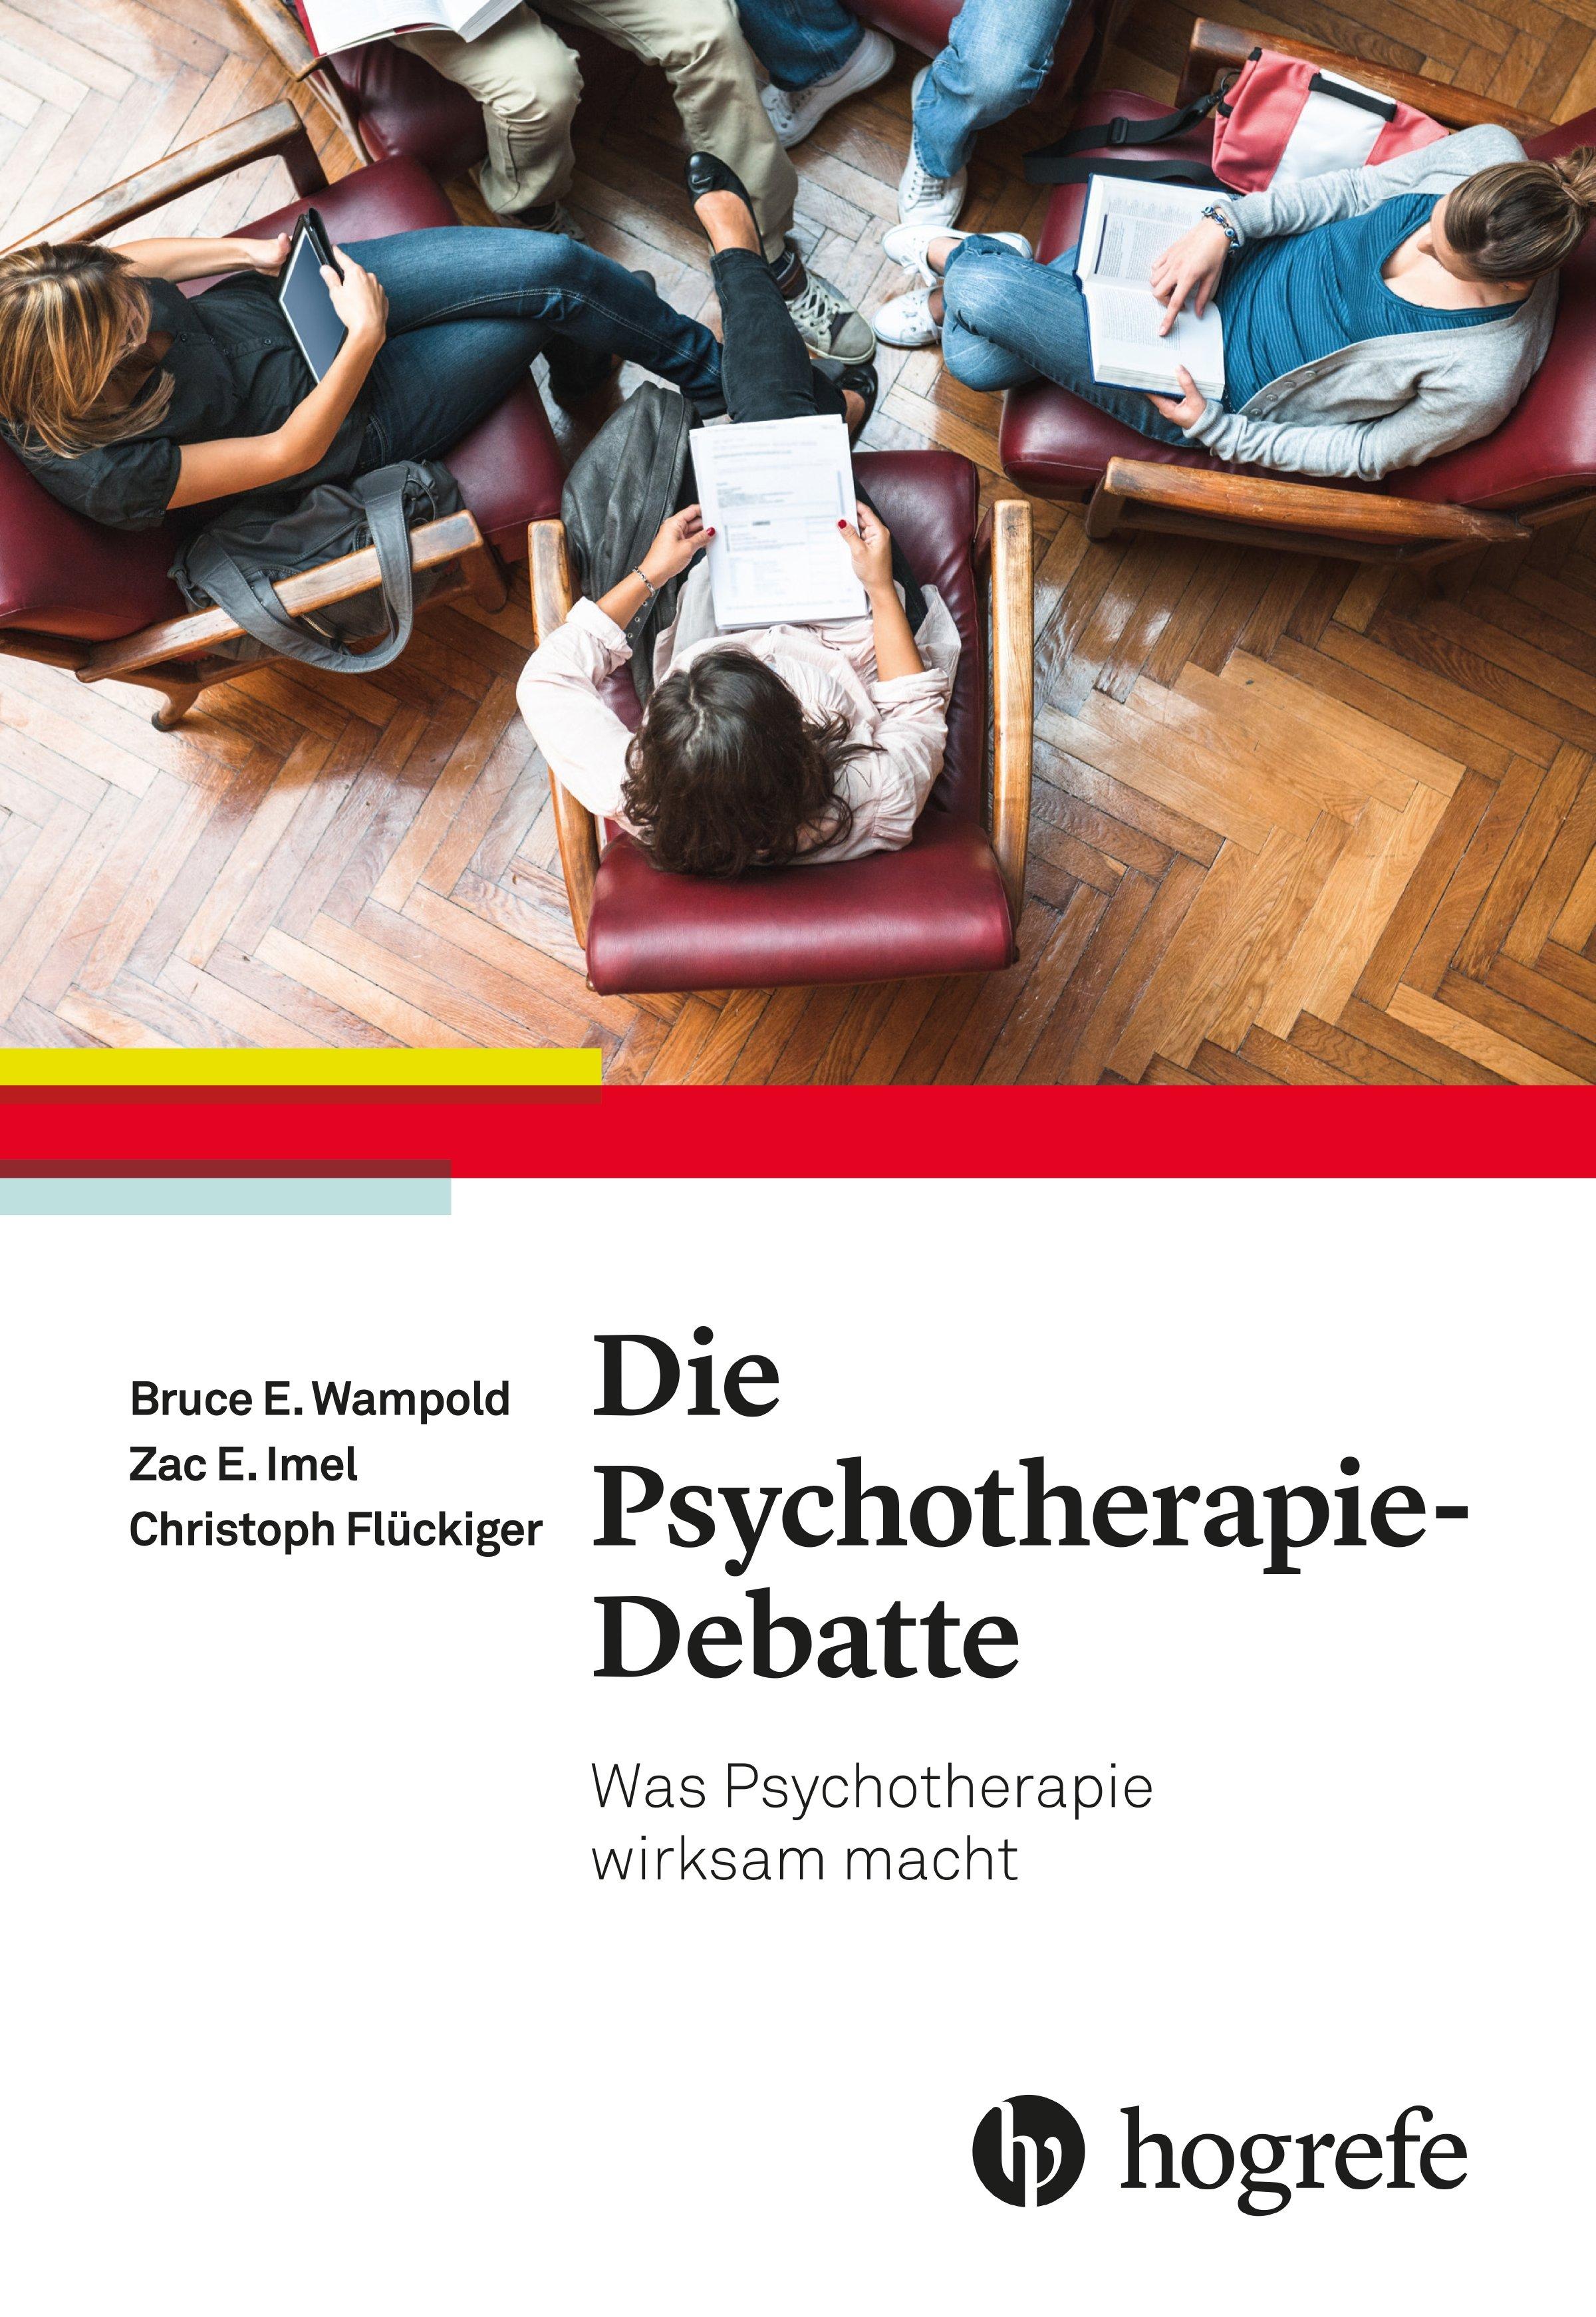 Die Psychotherapie-Debatte